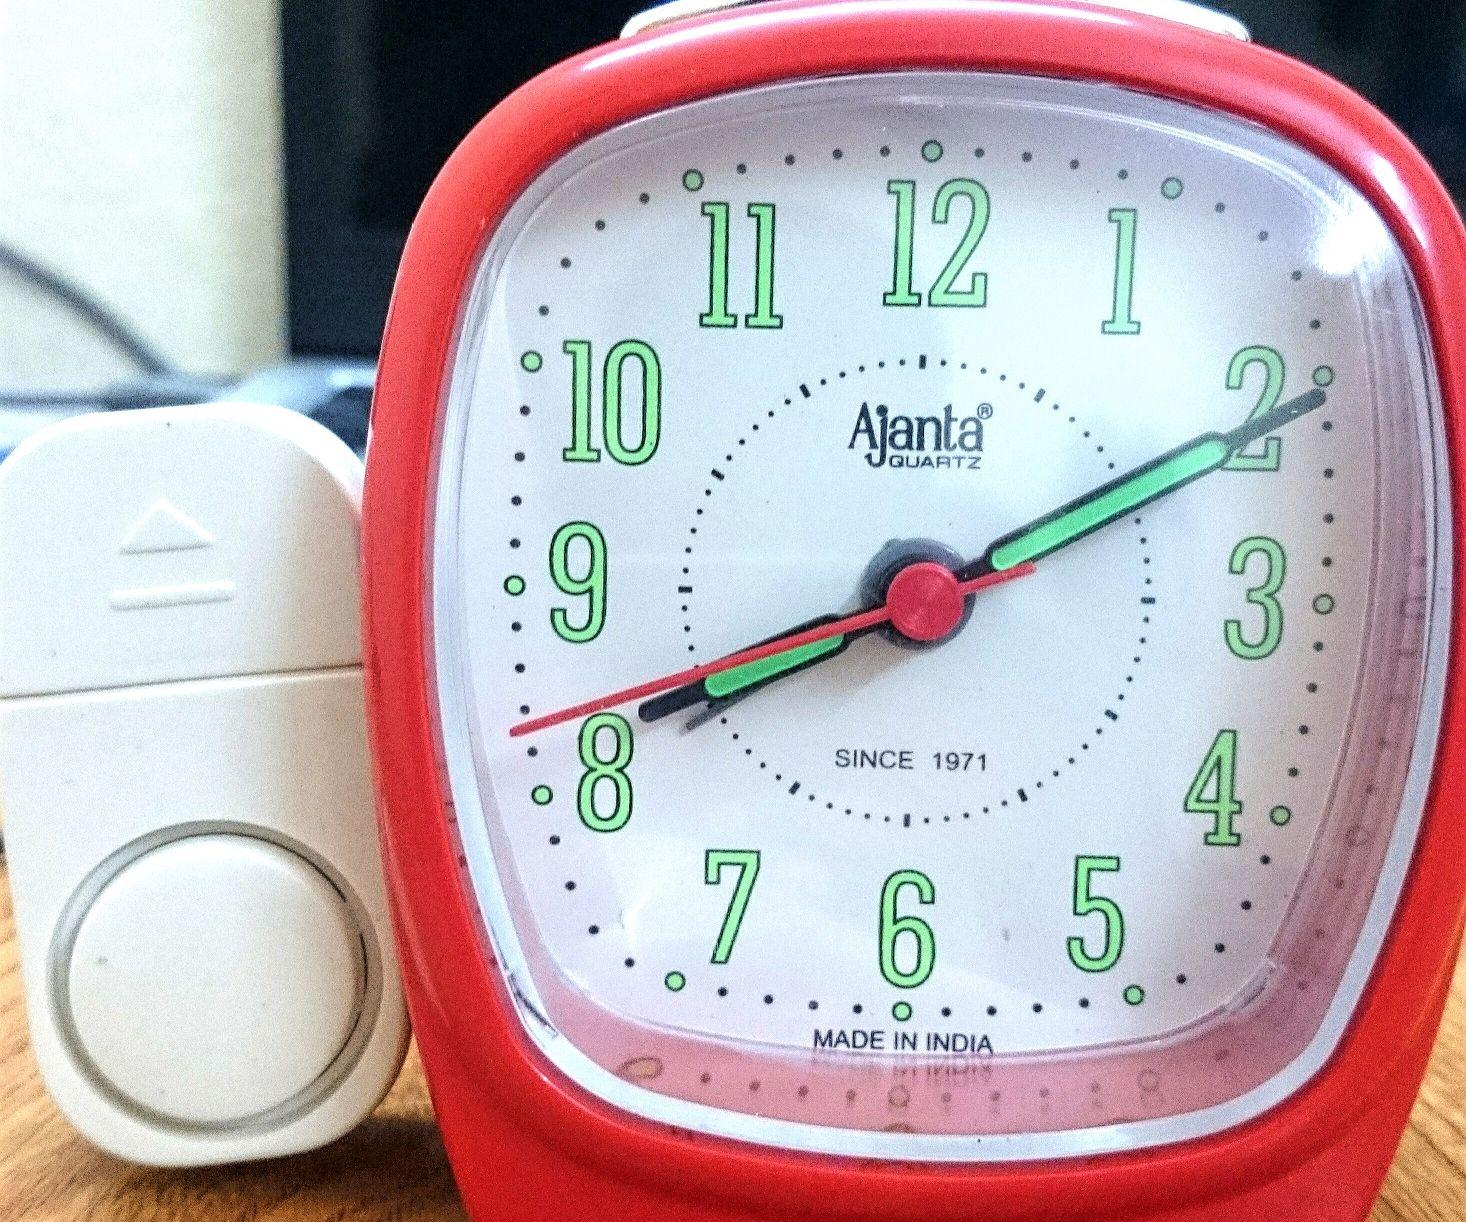 Extreme loud alarm clock